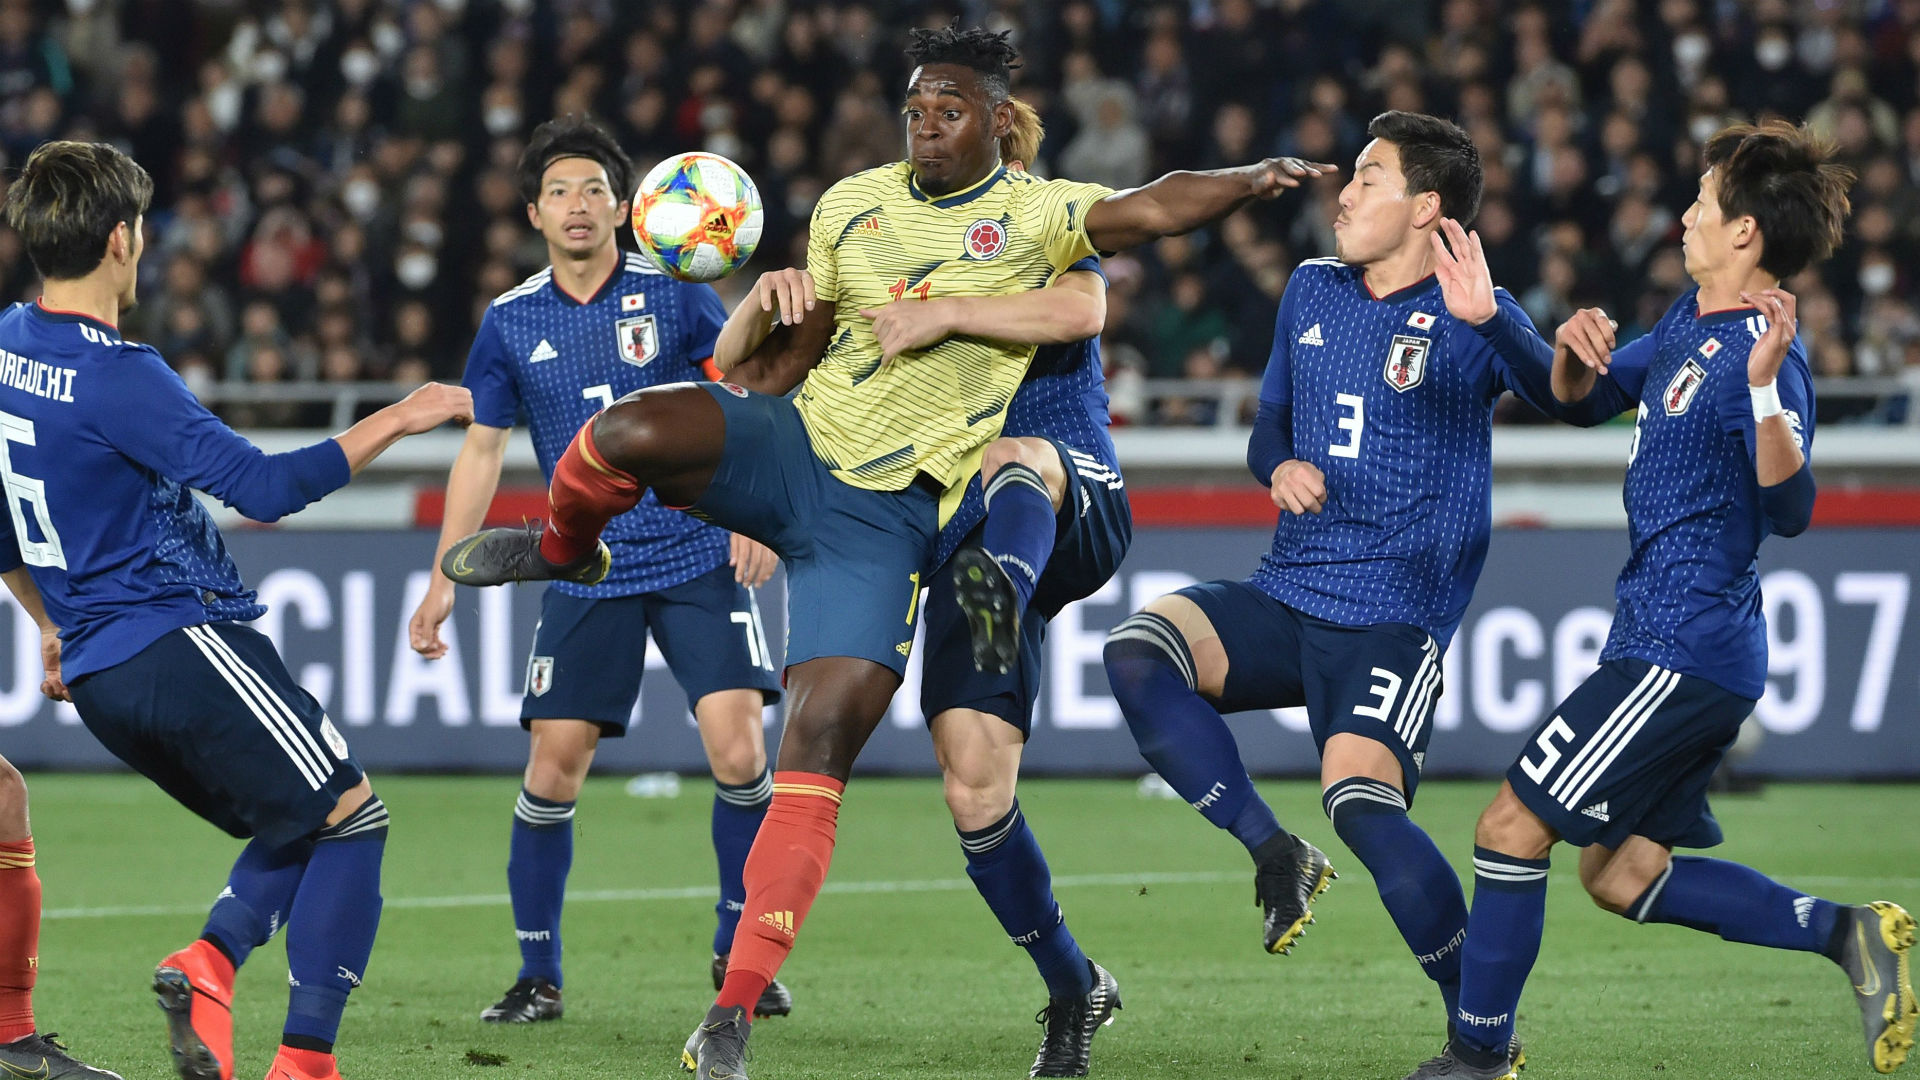 Duván Zapata Colombia - Japón amistoso 2019